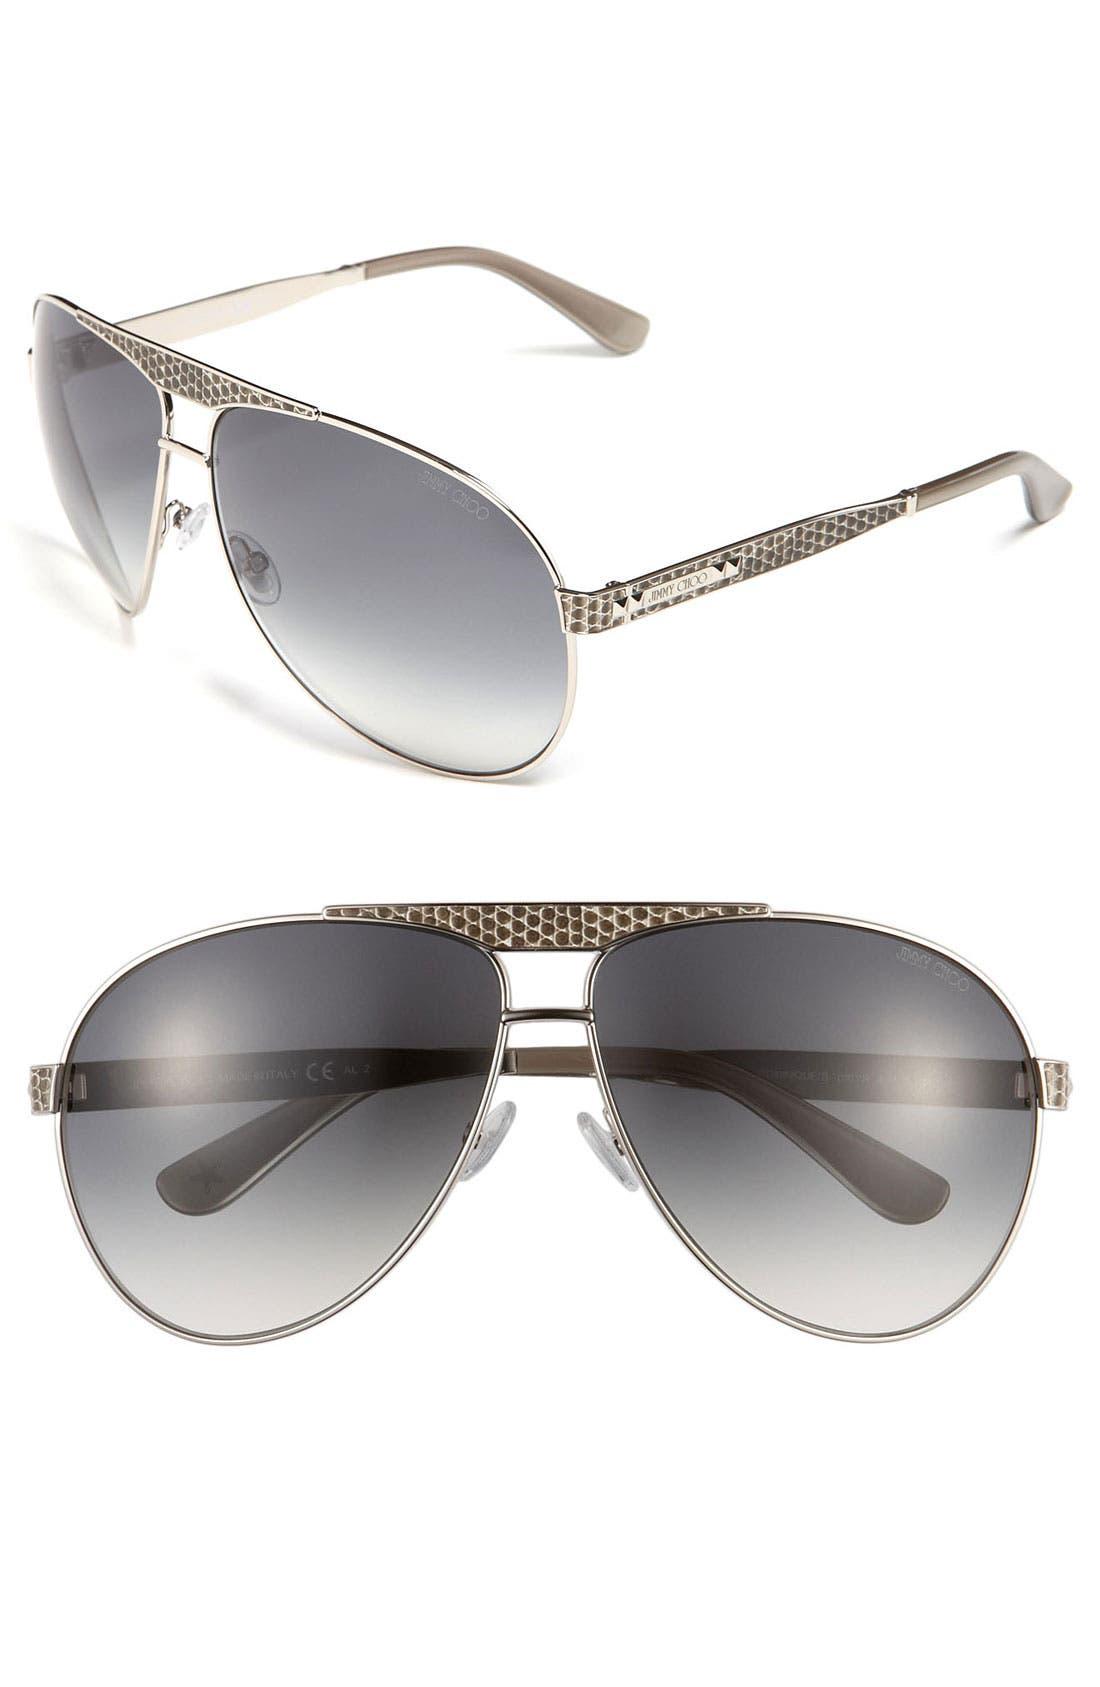 Alternate Image 1 Selected - Jimmy Choo 'Dominique' Aviator Sunglasses